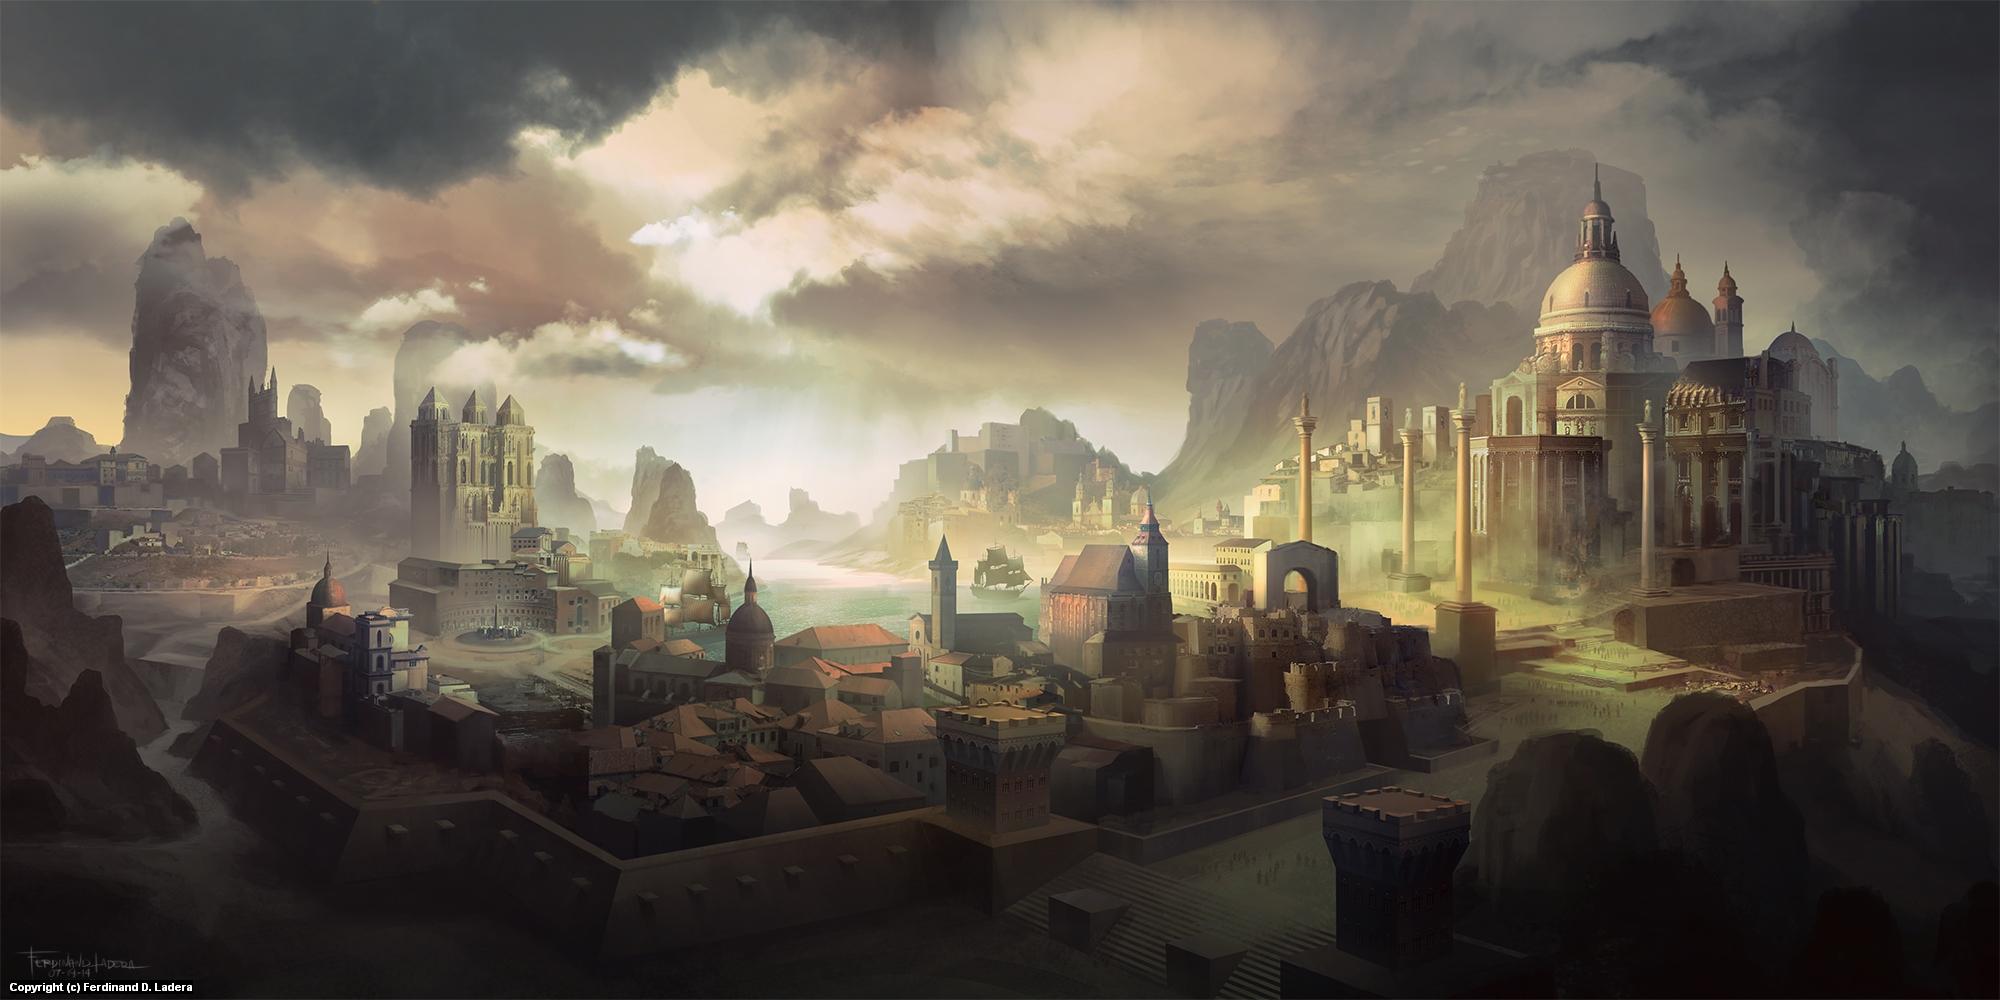 The City of Swynston Artwork by Ferdinand Ladera